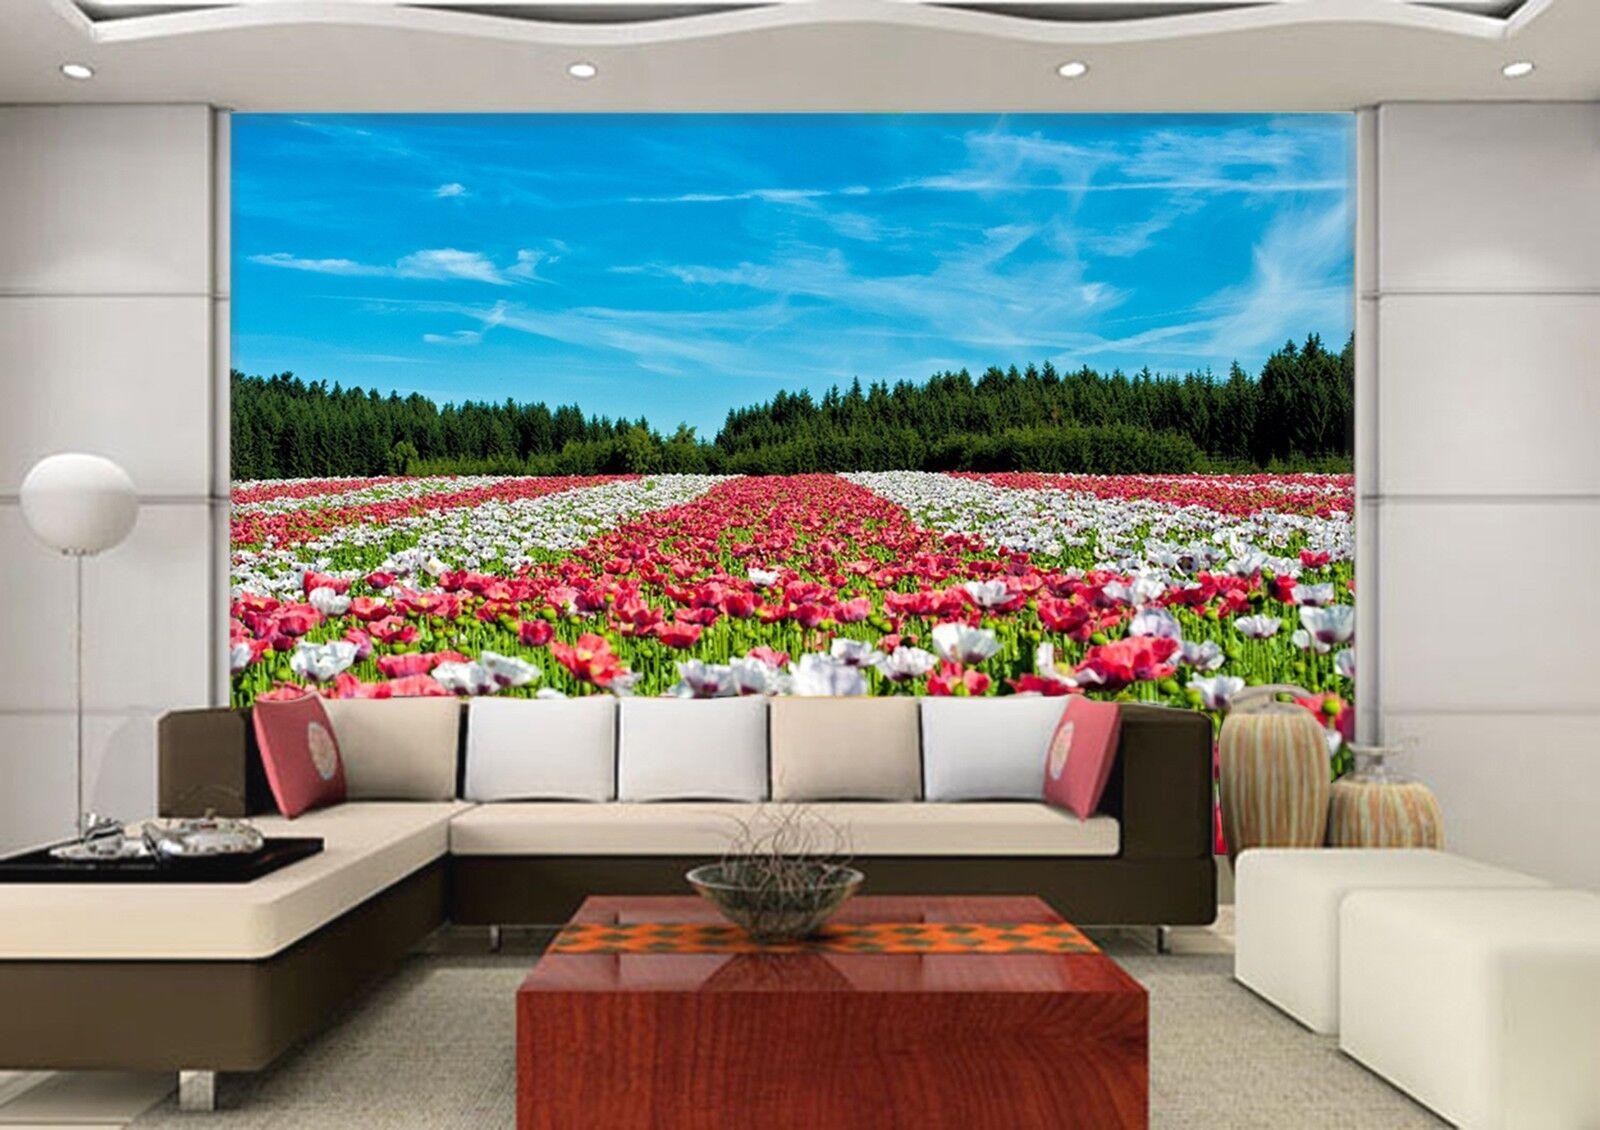 3D Blaumen Blauer Himmel 979 Tapete Wandgemälde Tapeten Bild Familie DE Lemon  | Hochwertige Produkte  | Neue Produkte im Jahr 2019  | Wunderbar